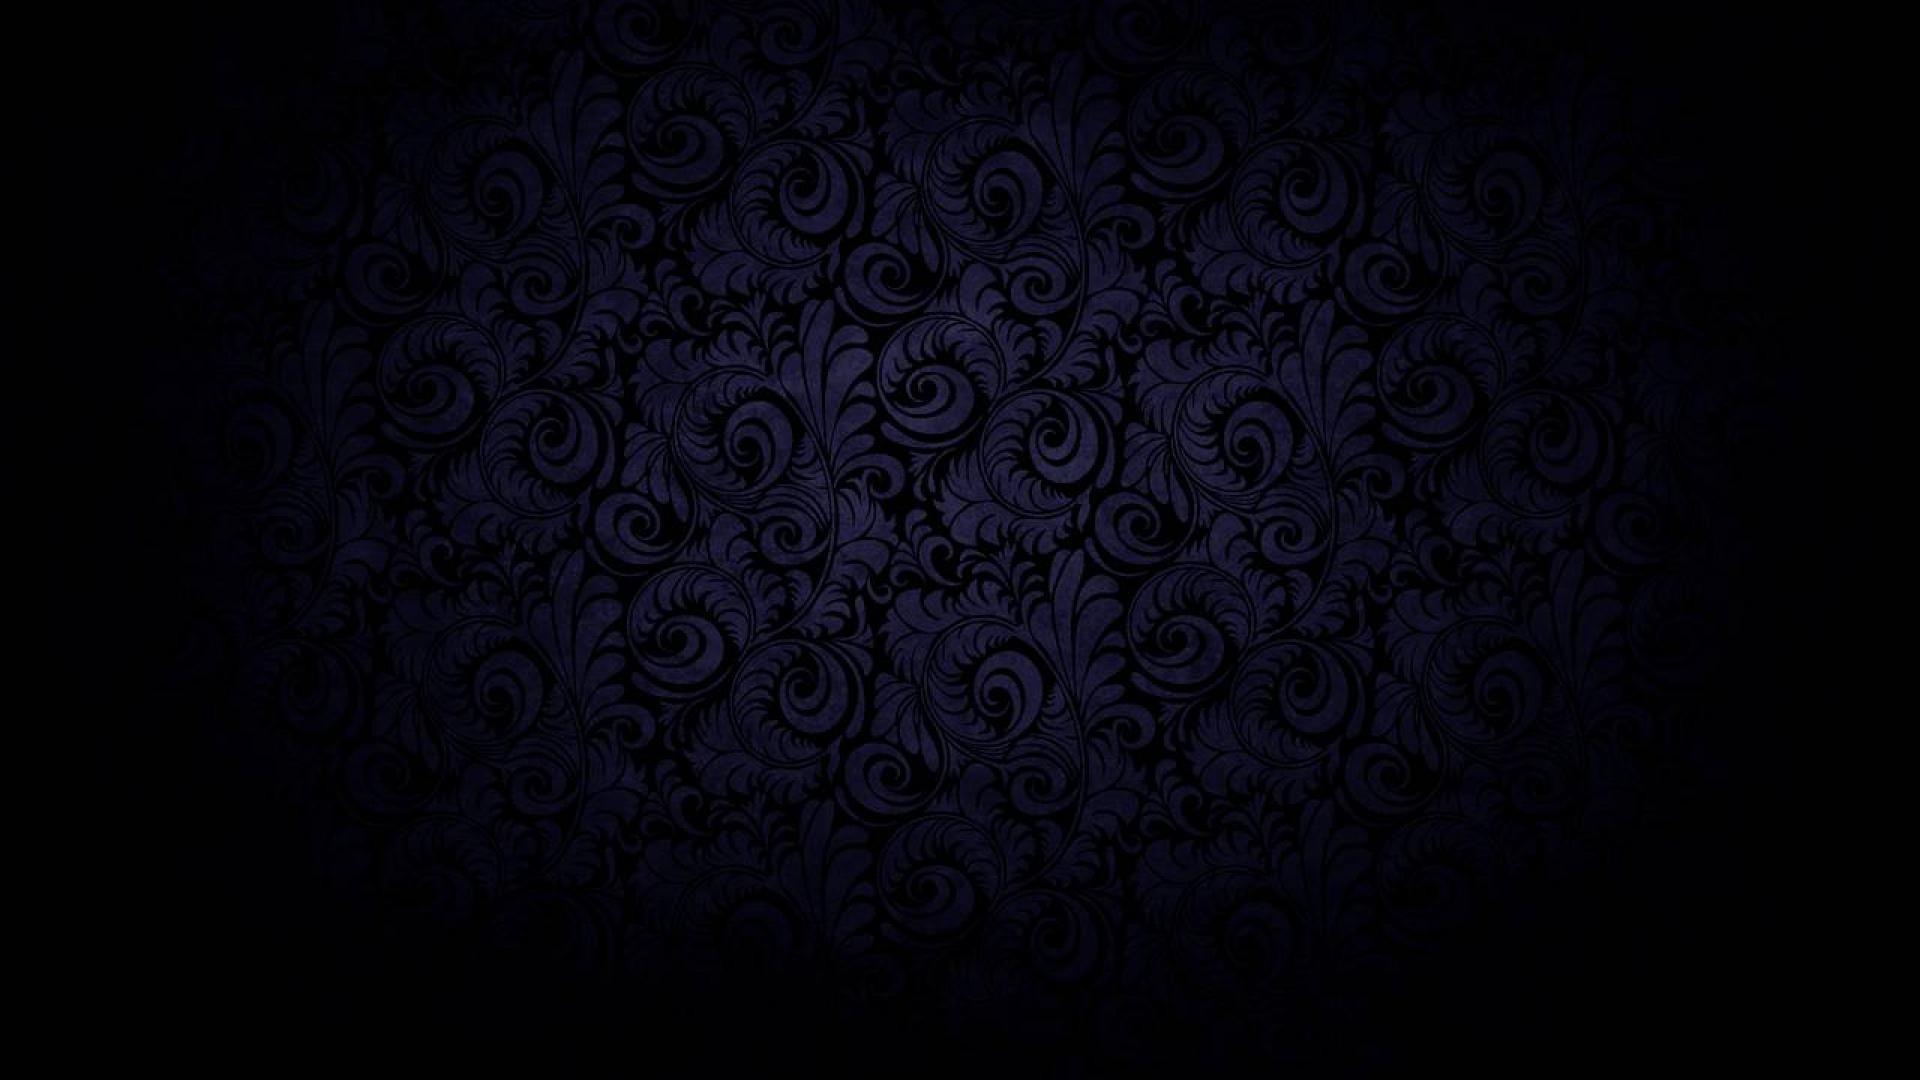 Dark black curved bloom blue Wallpaper – MixHD wallpapers